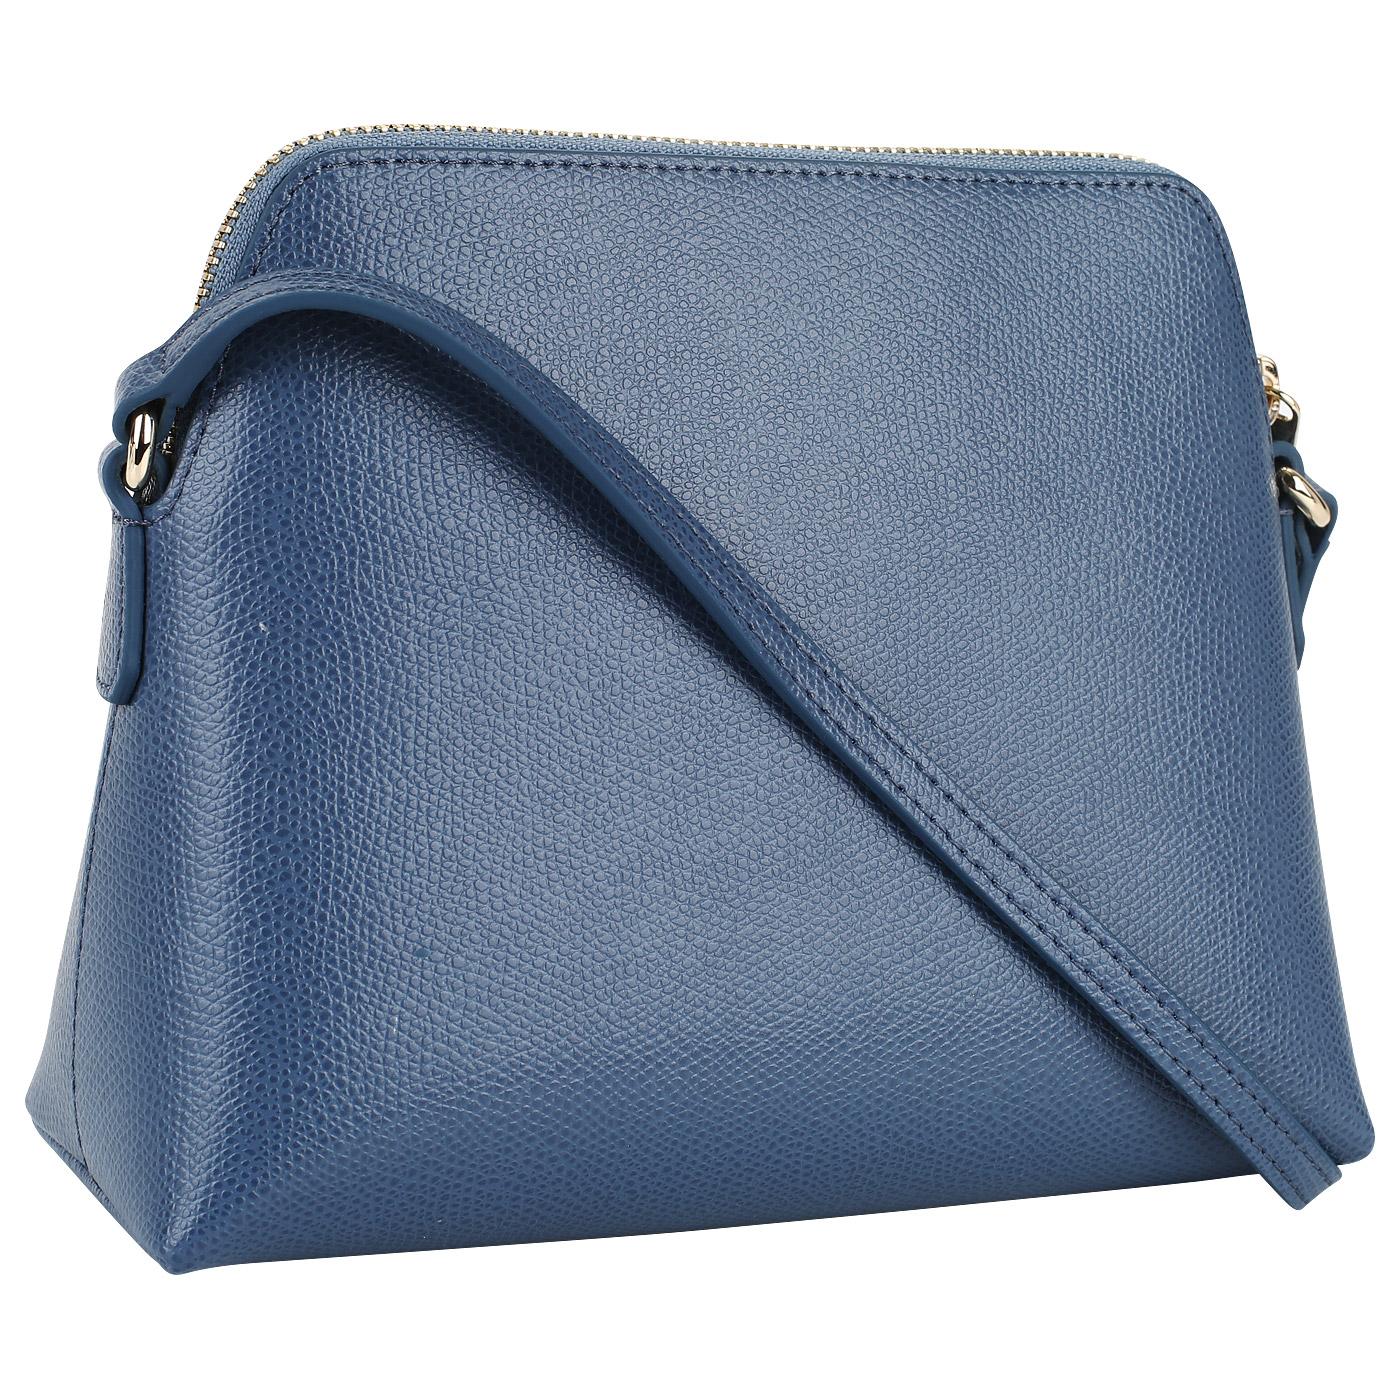 b13e99d40774 Кожаная сумочка с косметичкой Furla Boheme